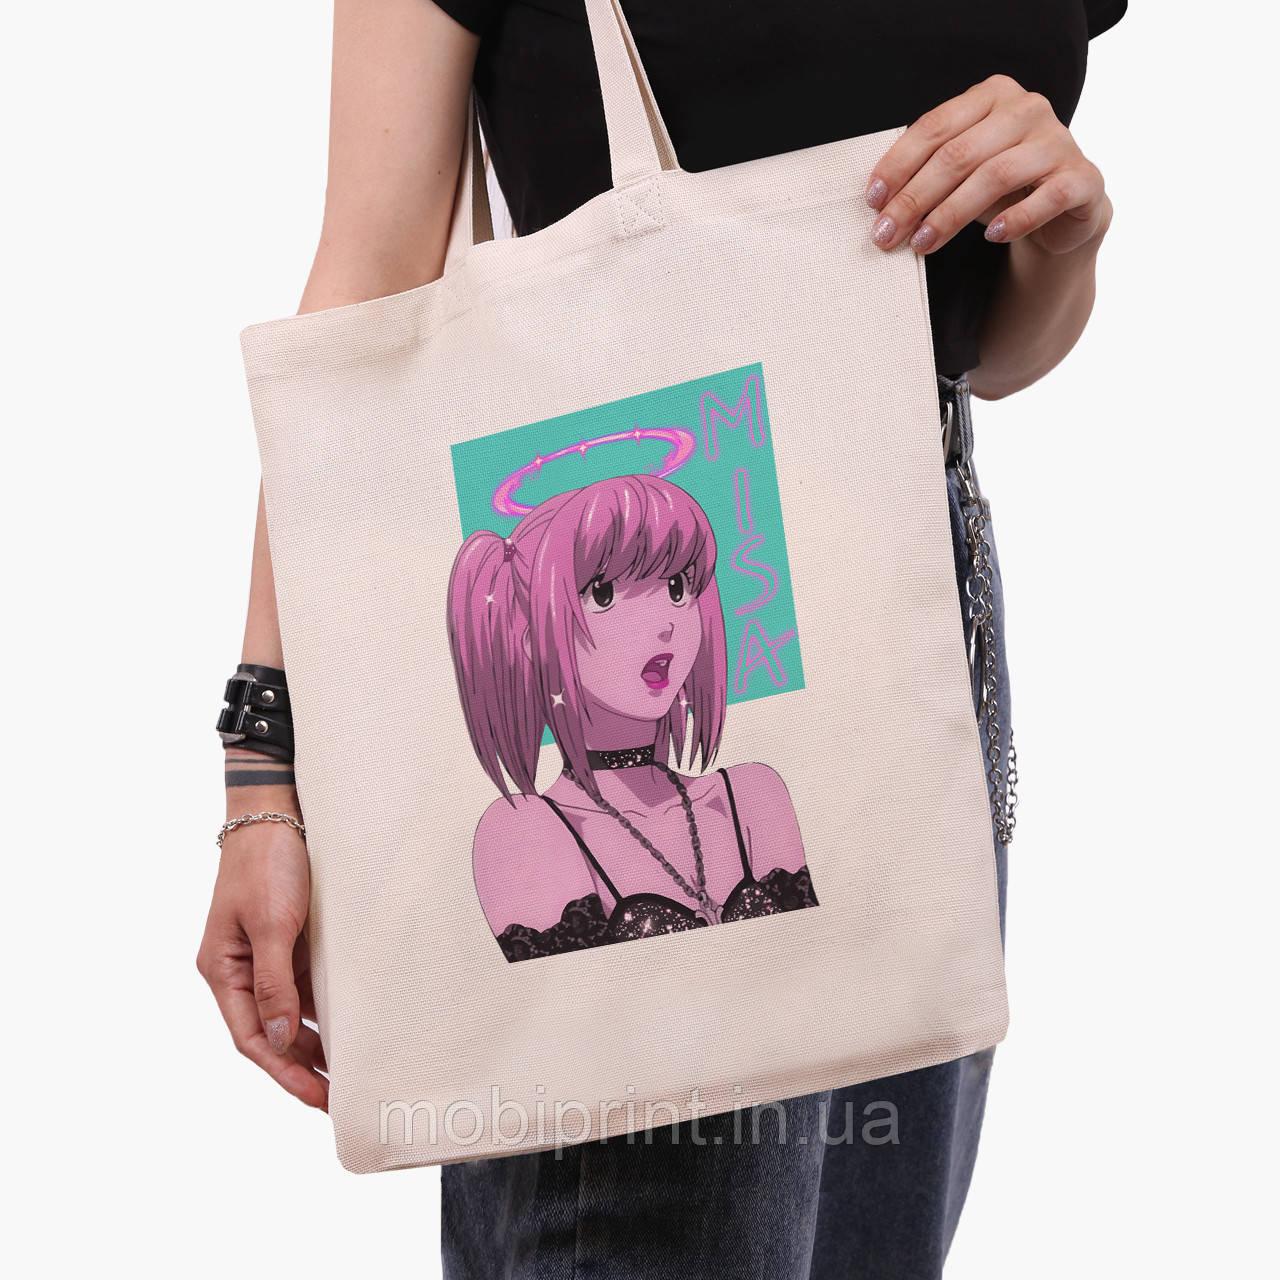 Еко сумка шоппер Міса Аманэ Зошит смерті (Misa Amane Death Note) (9227-2827) 41*35 см